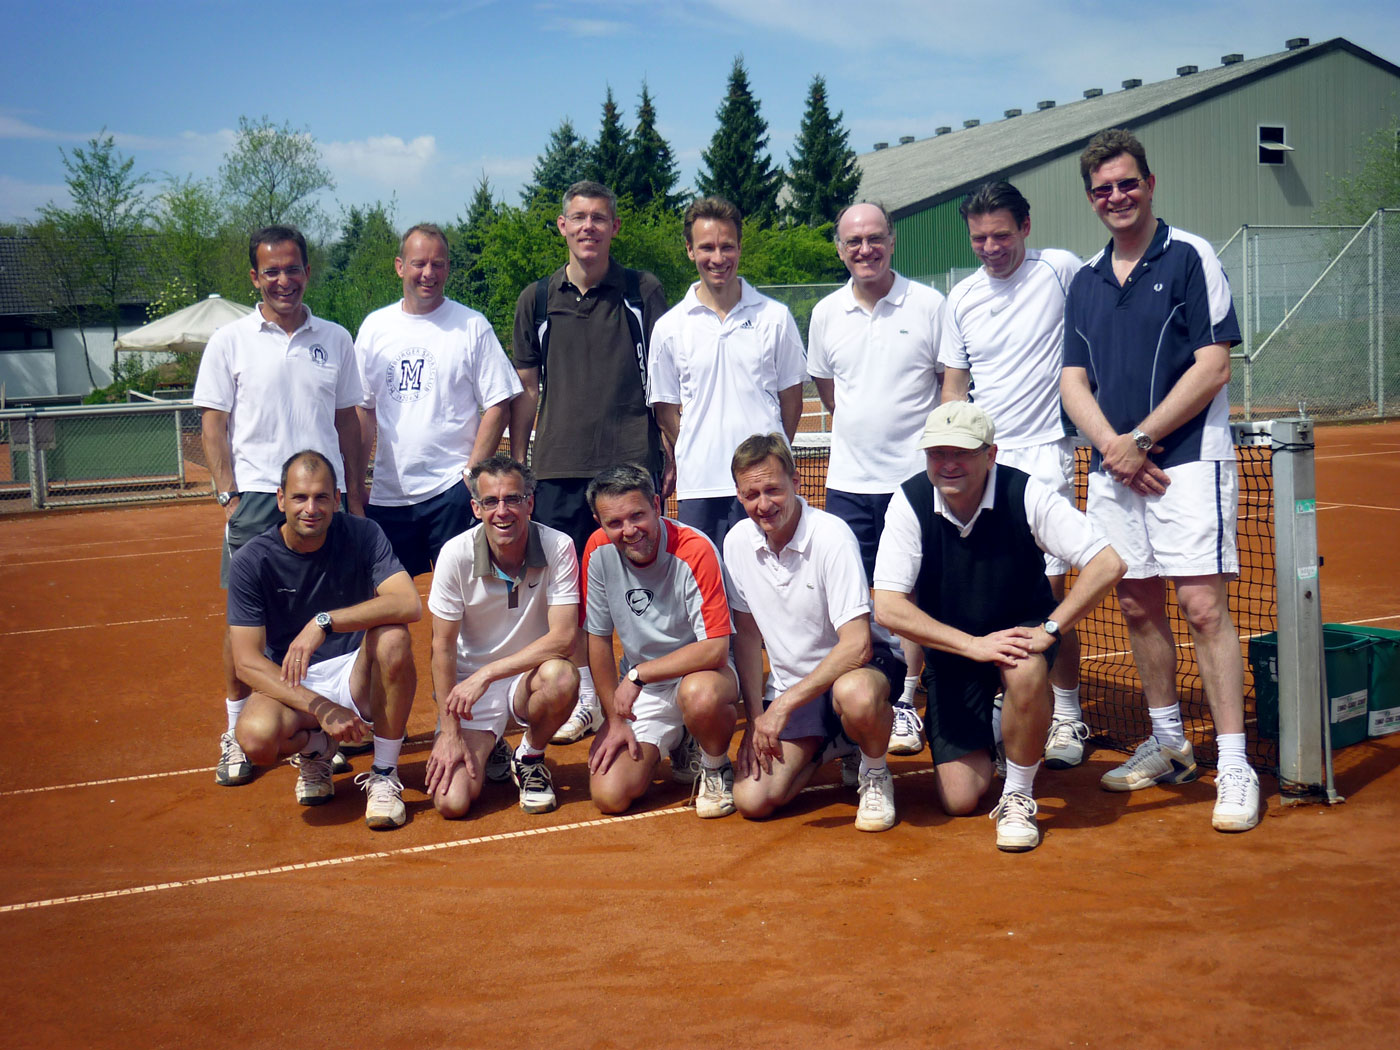 Workshop Doppel 2. & 3. Herren 40 mit Andy Schute